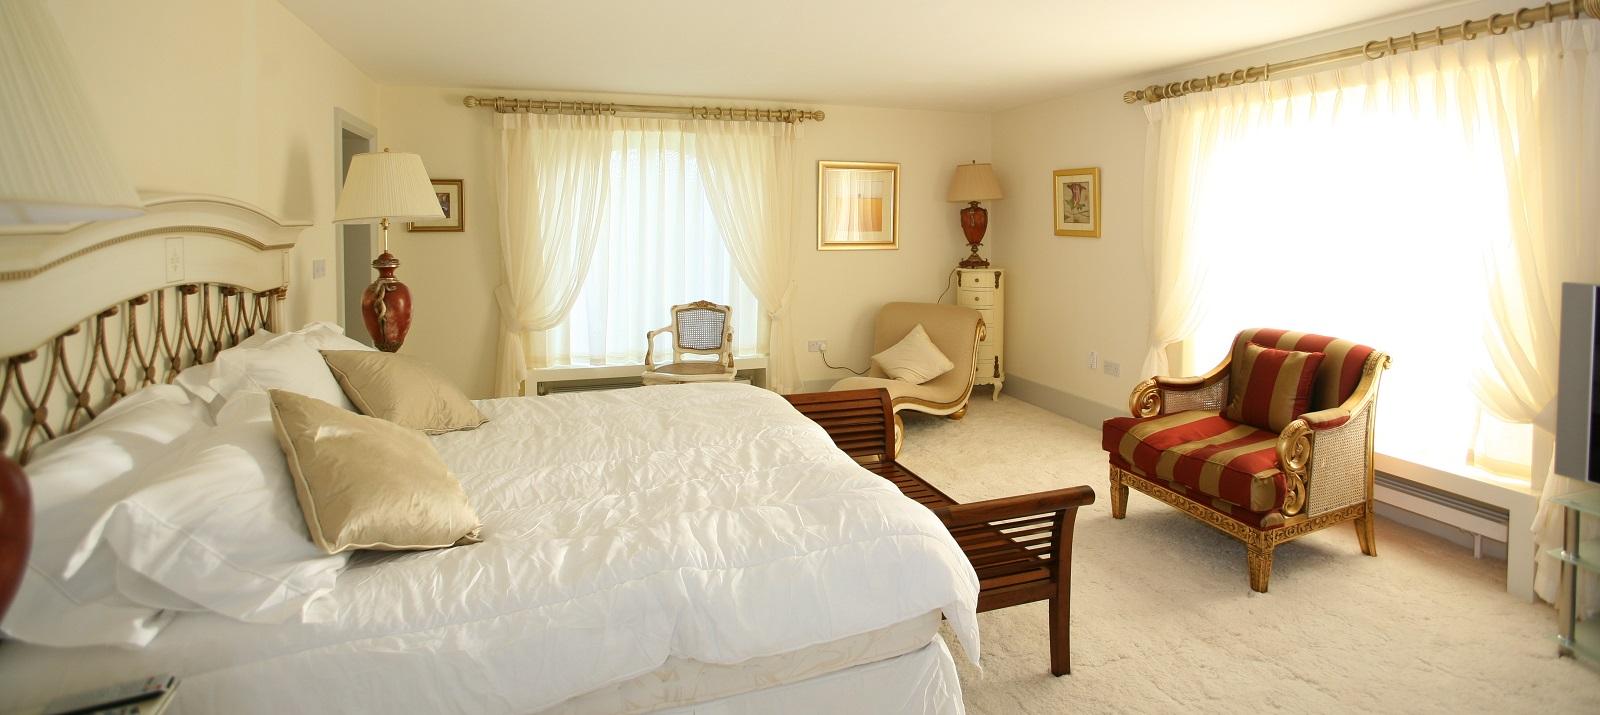 Short Term Room To Rent In Sligo